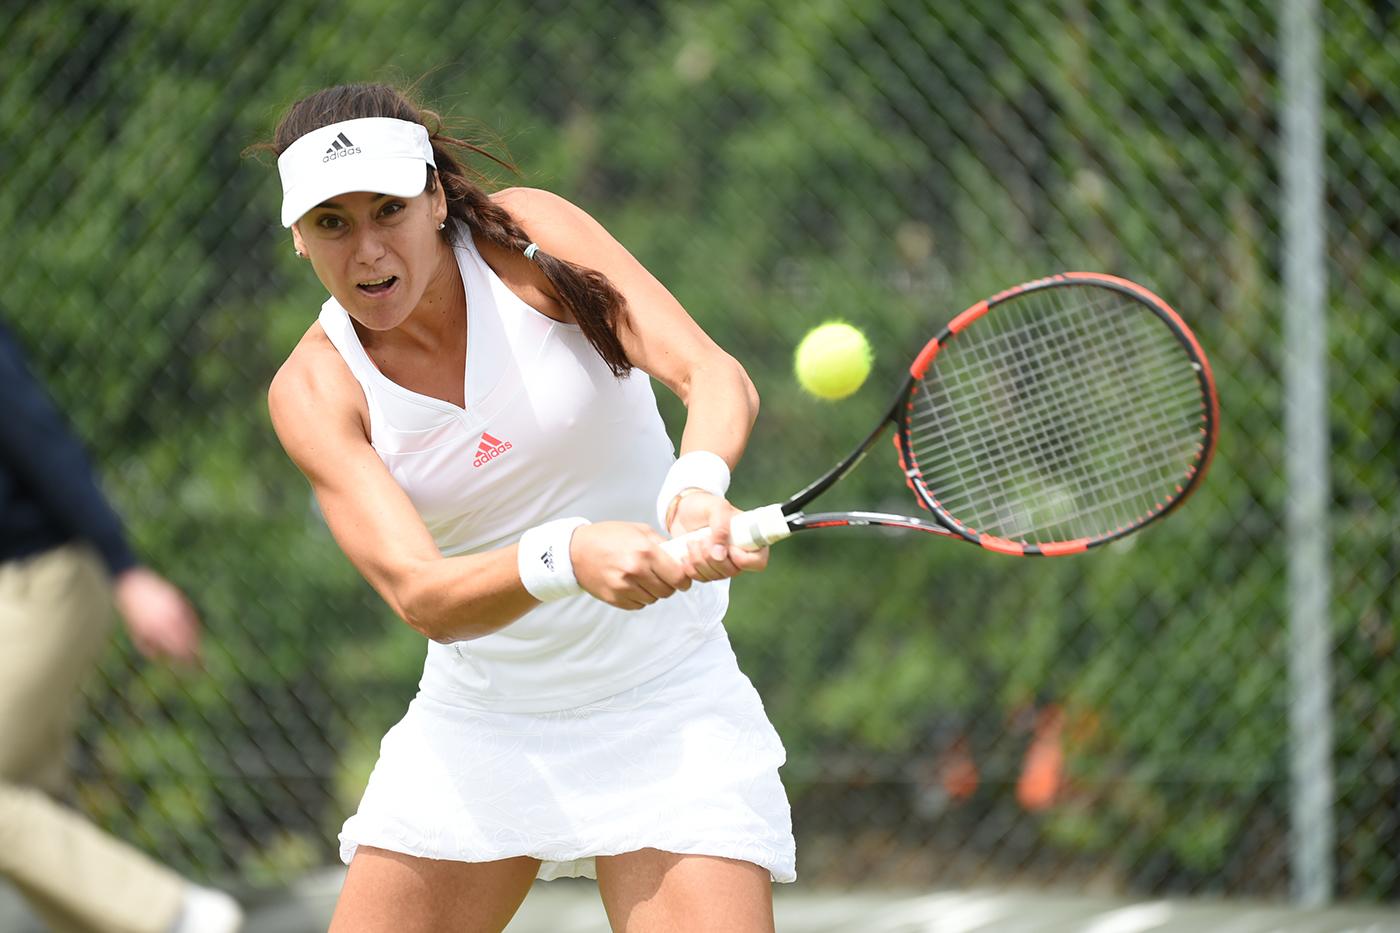 Romanii inainteaza greu in calificarile de la Wimbledon